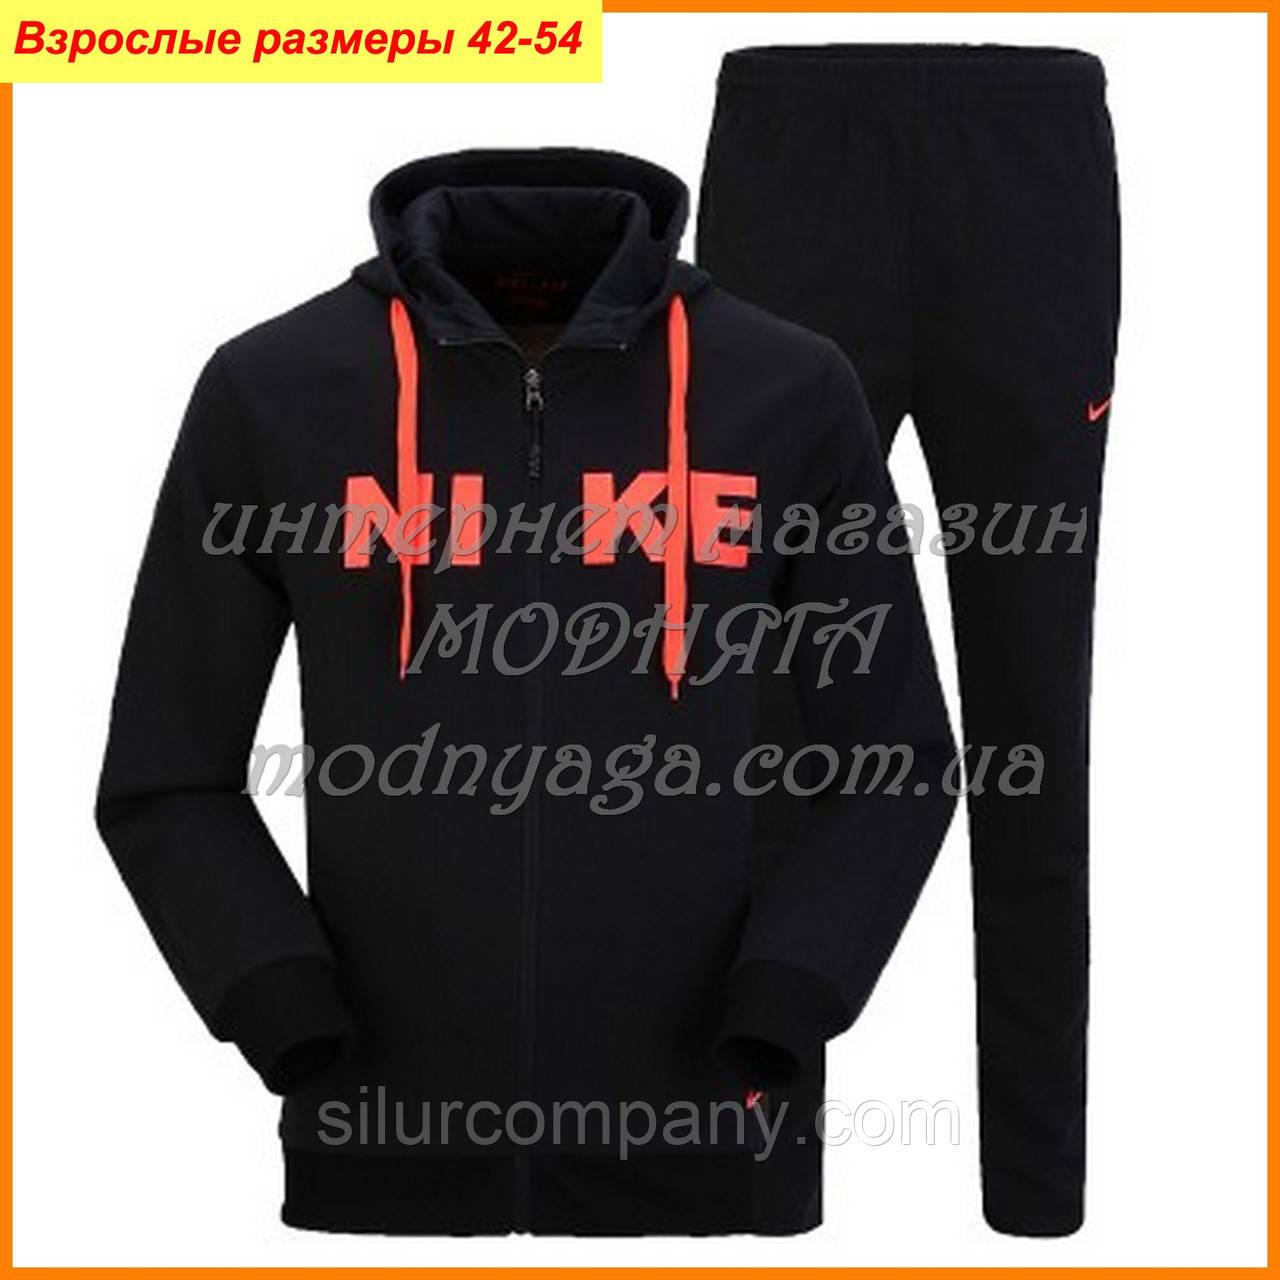 9a7eda79 Спортивный костюм мужской цена | adidas, nike, puma, armani, фото 1 -2%  Скидка · Спортивный костюм мужской ...